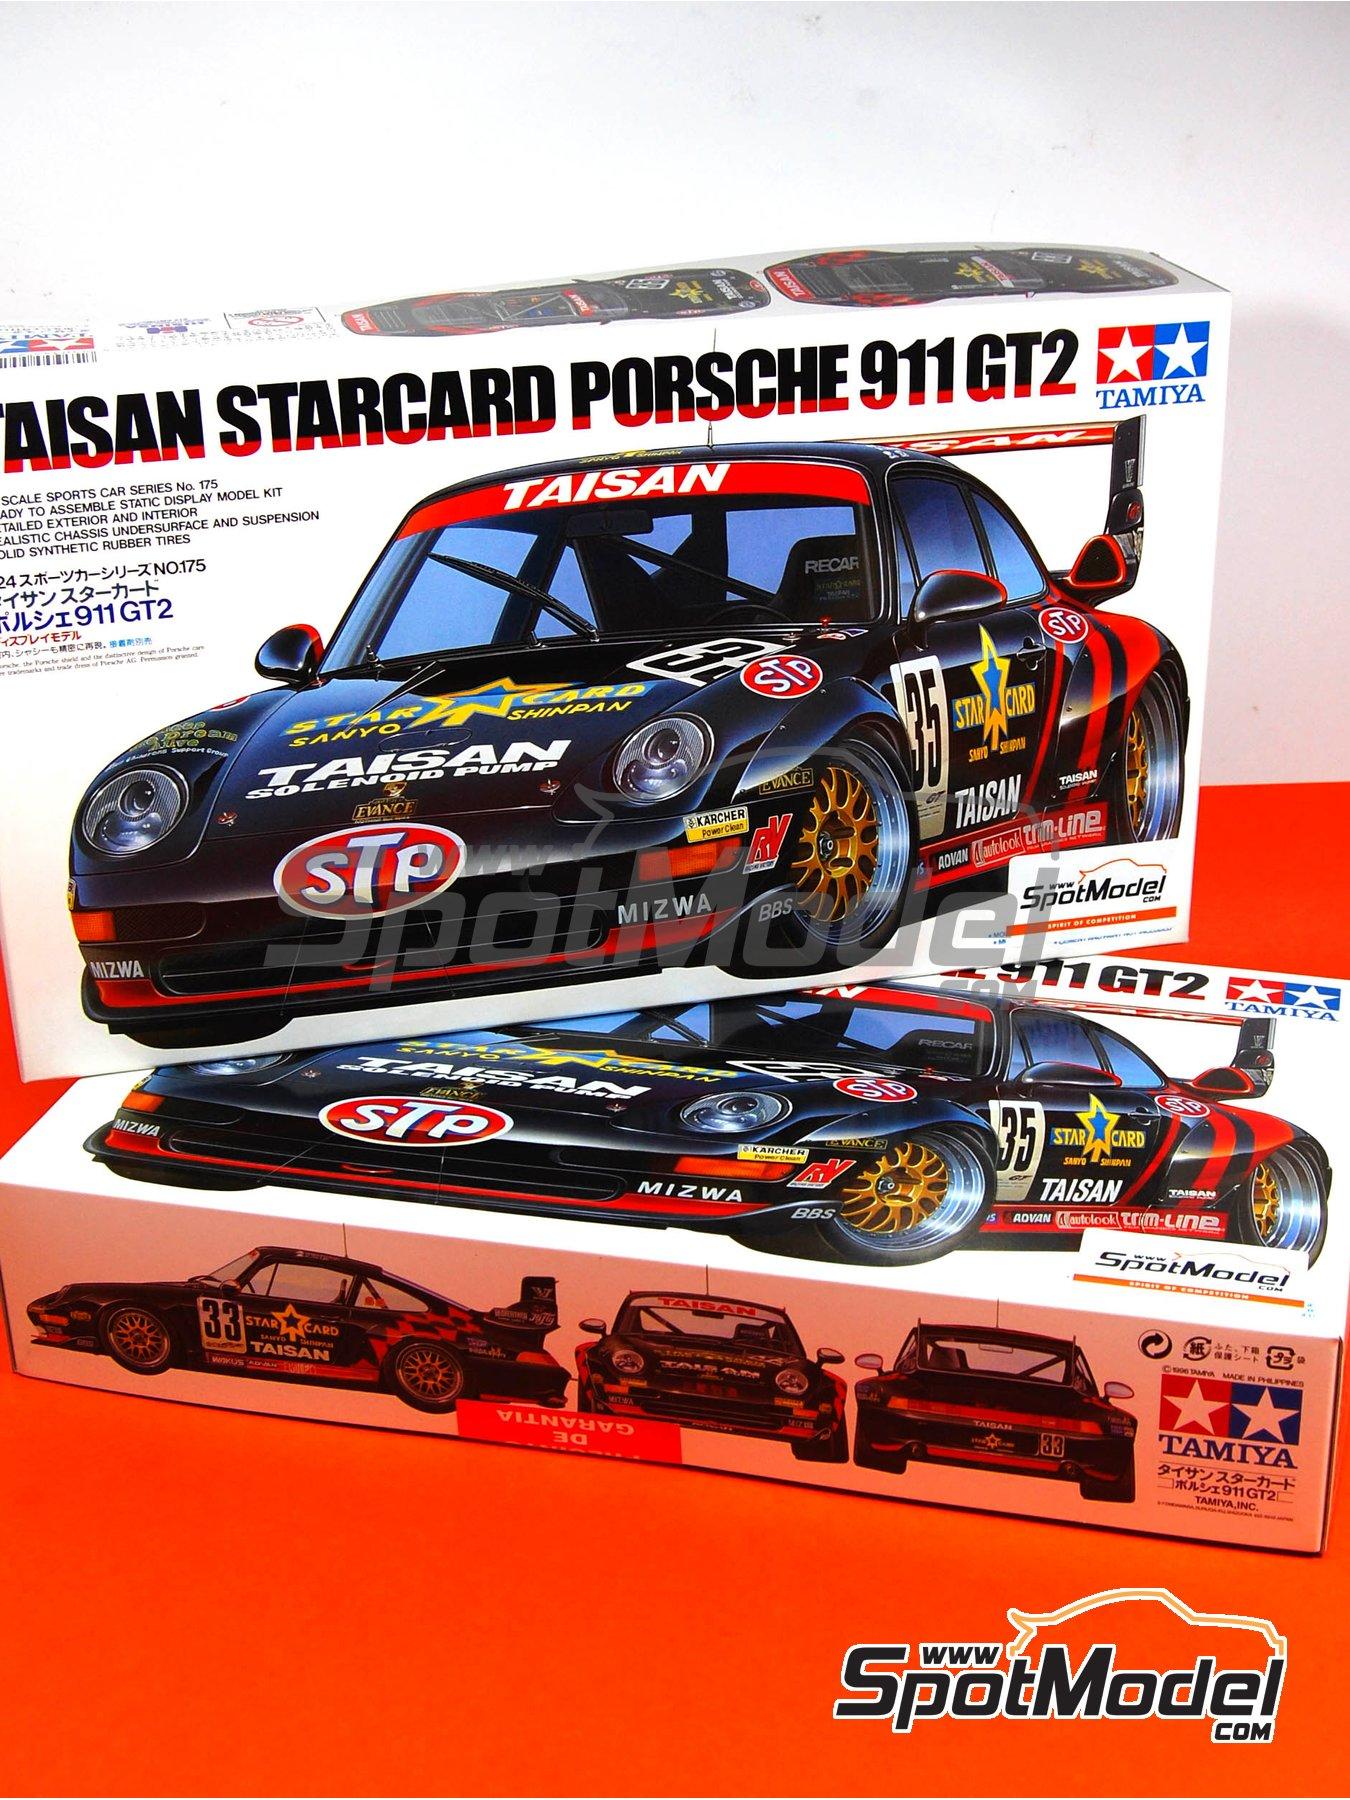 tamiya model car kit 1 24 scale porsche 911 993 gt2 taisan 25 matsuda. Black Bedroom Furniture Sets. Home Design Ideas